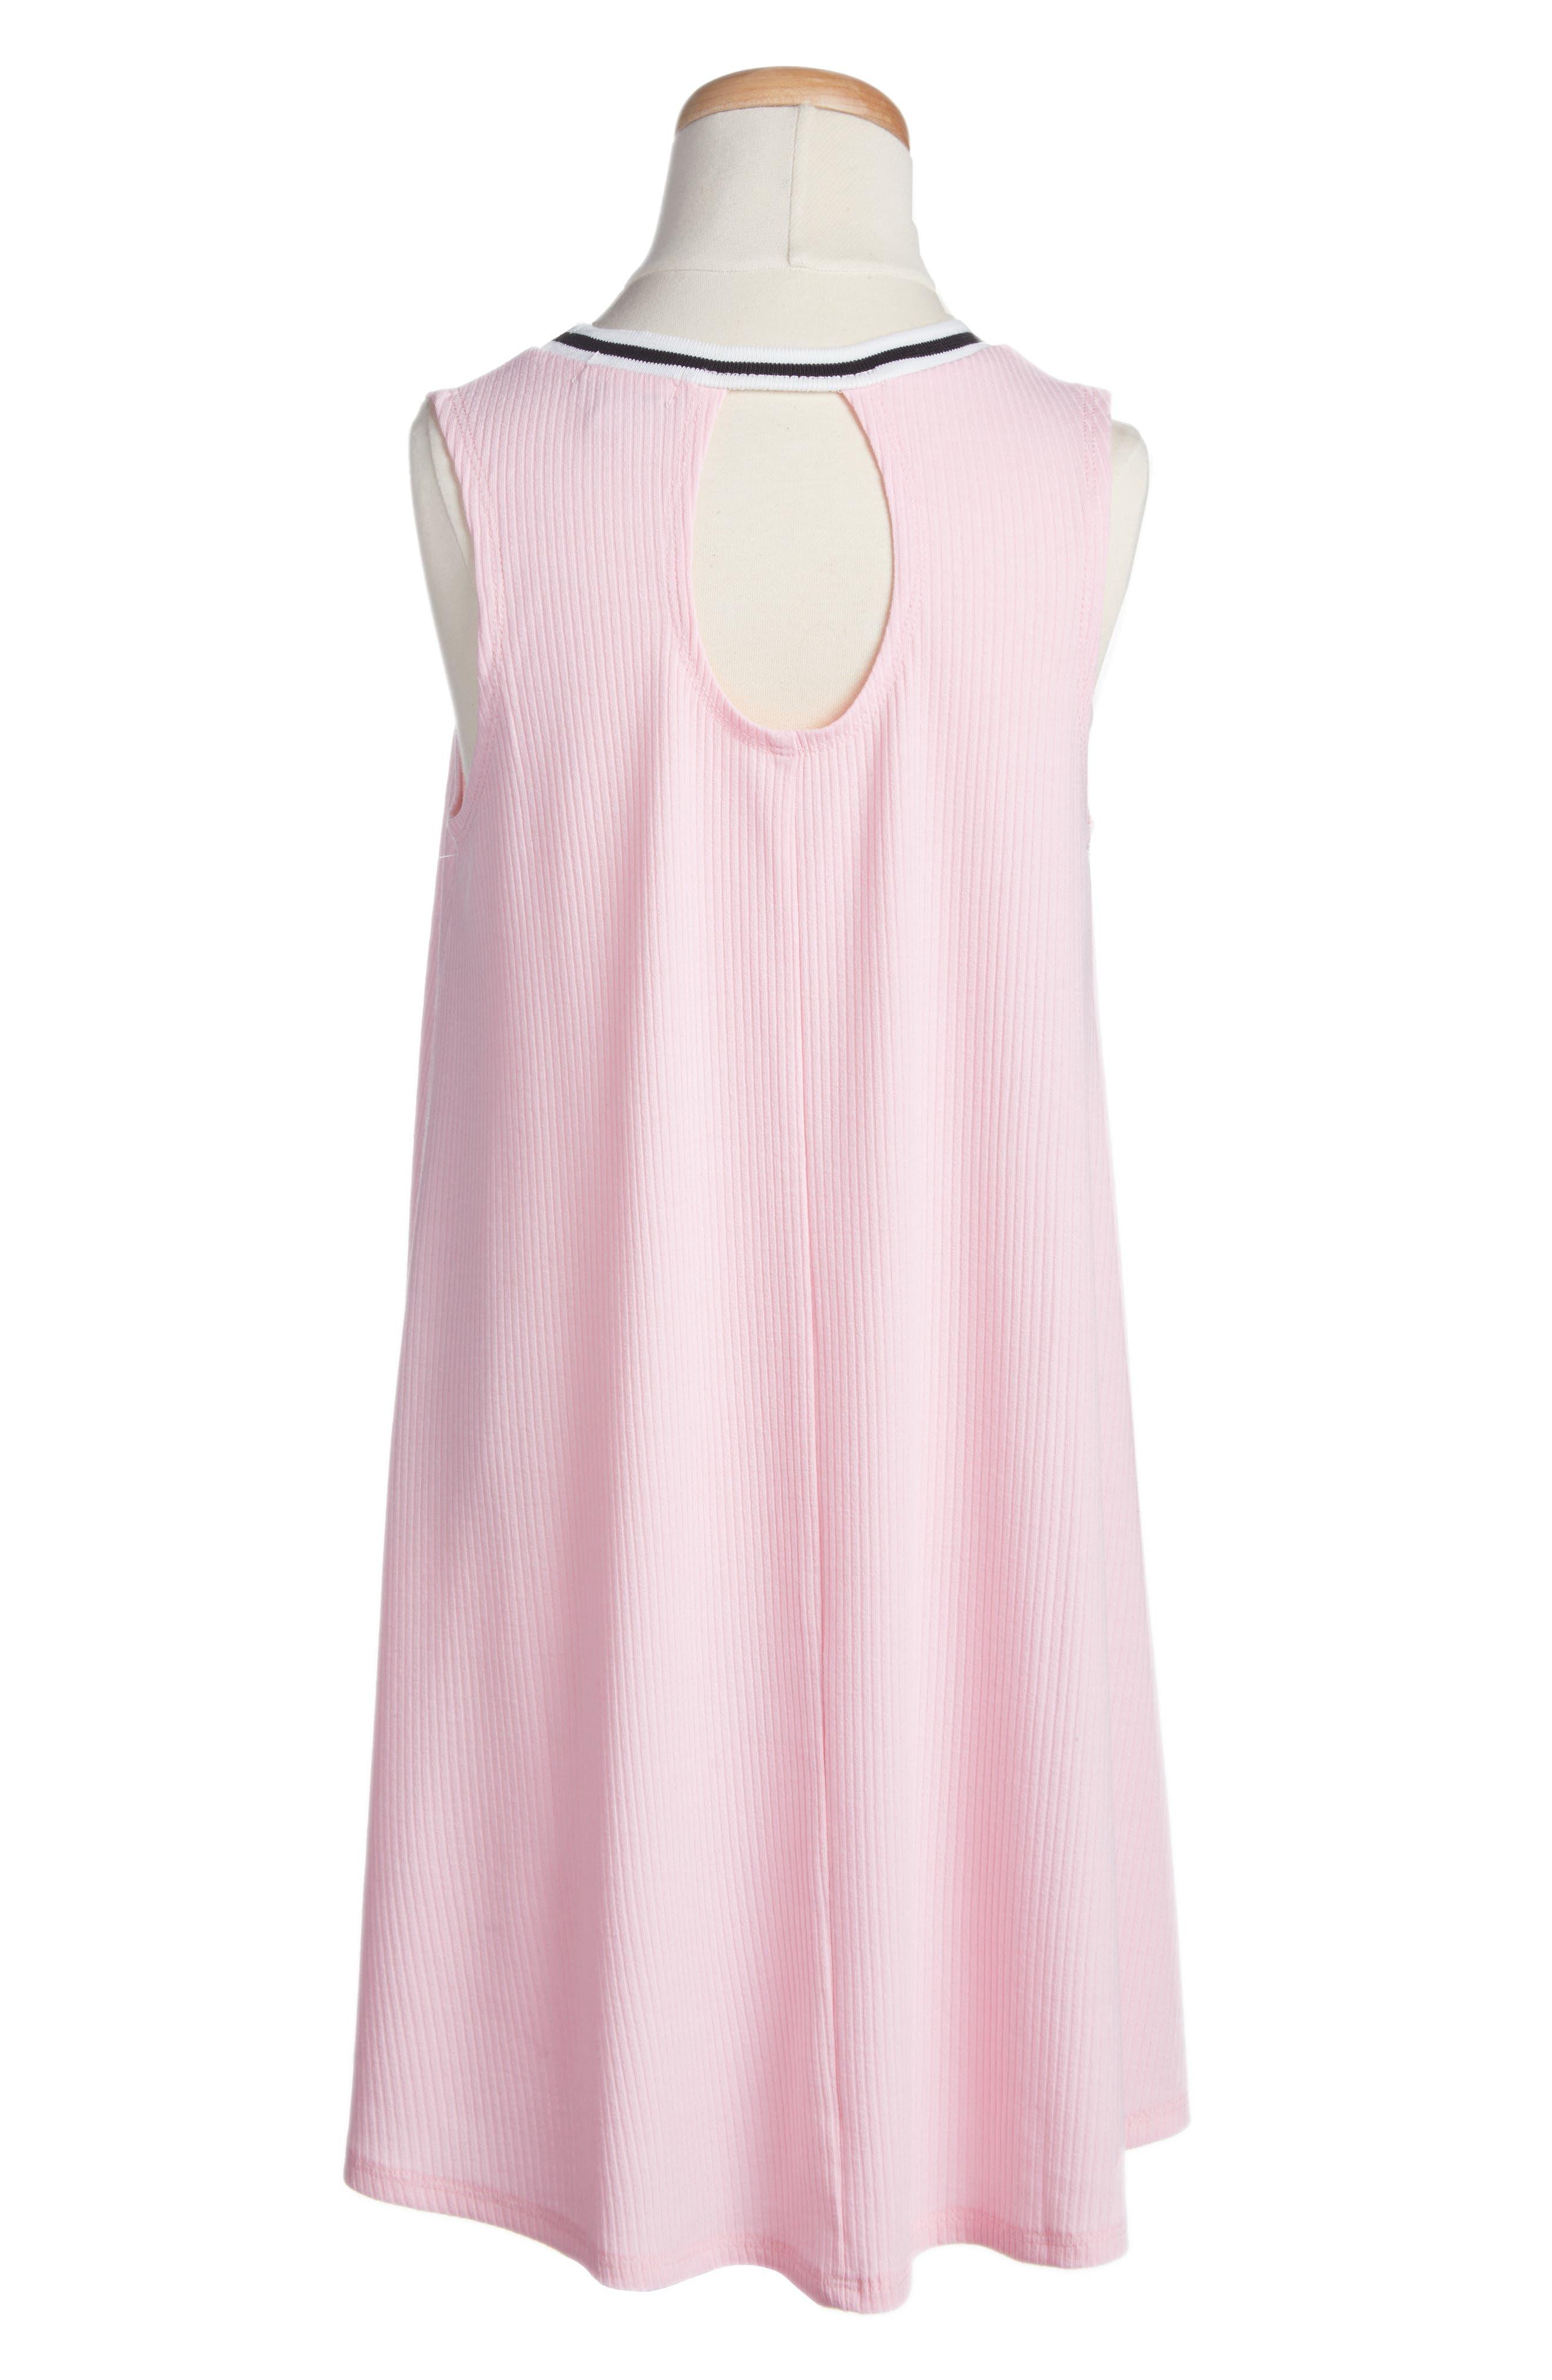 Ringer Tank Dress,                             Alternate thumbnail 2, color,                             CAMEO PINK